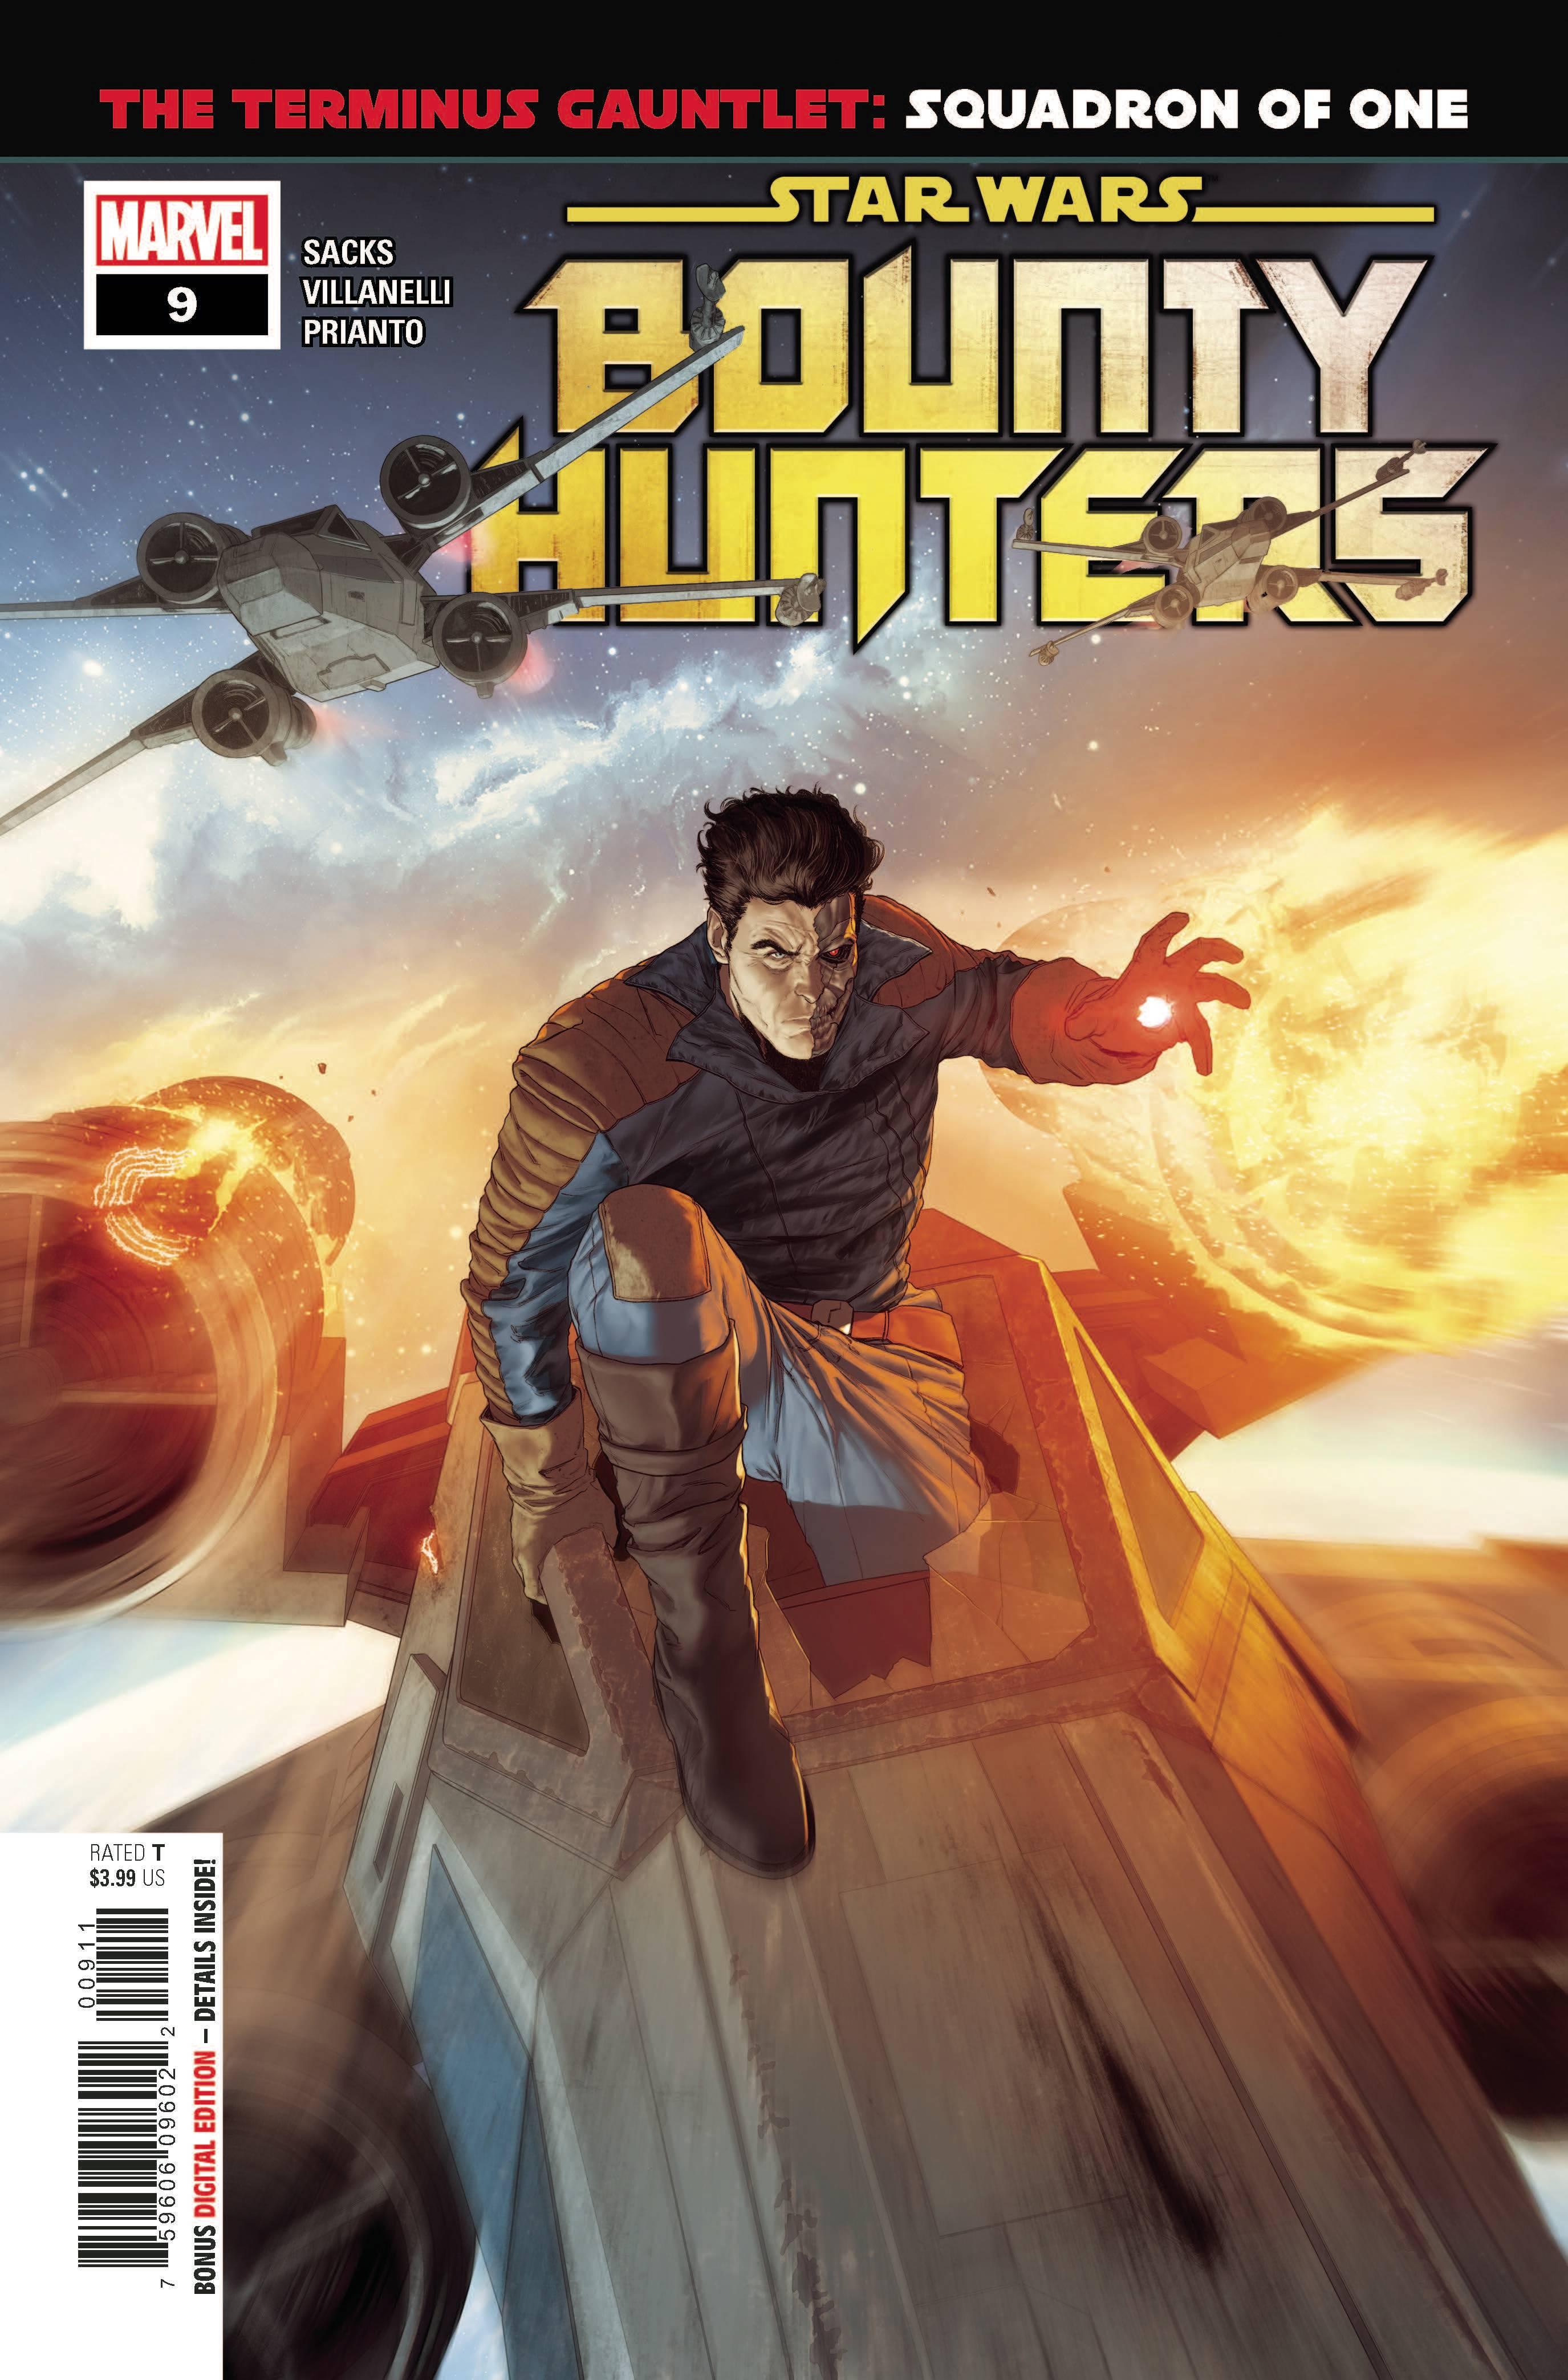 Star Wars: Bounty Hunters #9